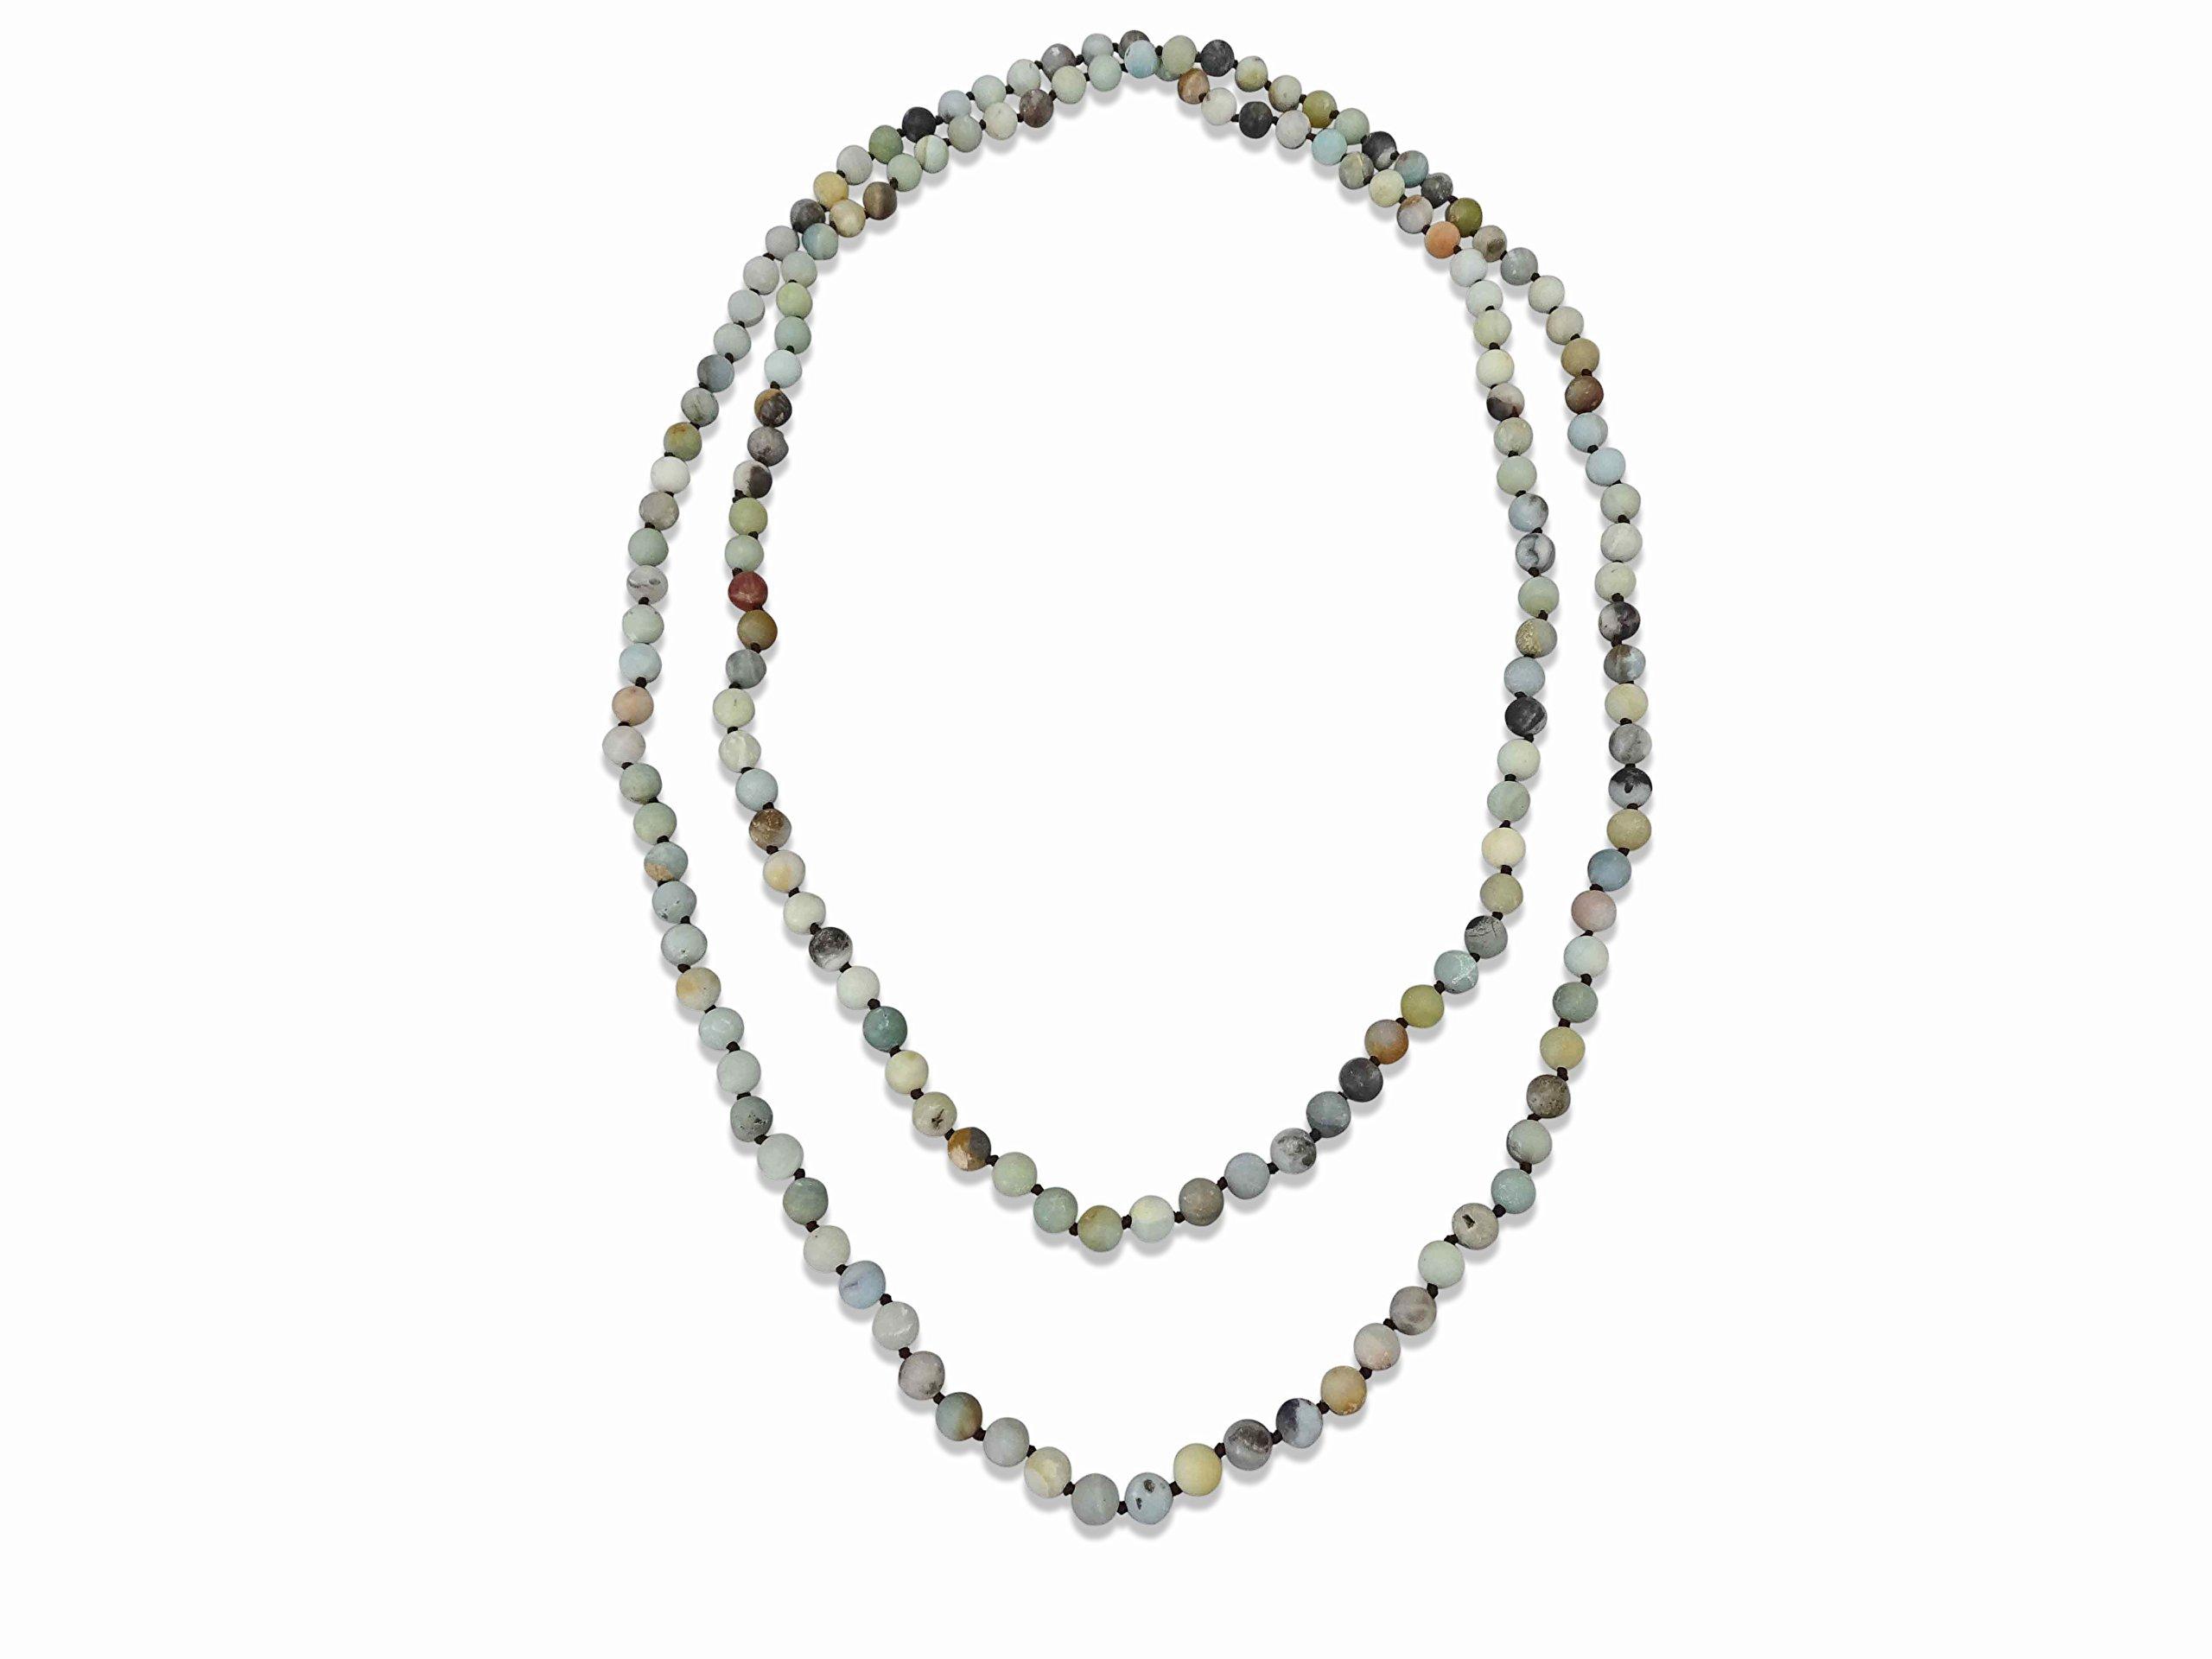 BjB Jewelry Endless Infinity Style Semi-Precious 8MM Matte Amazonite Beaded Strand Necklace, 60'' Long.